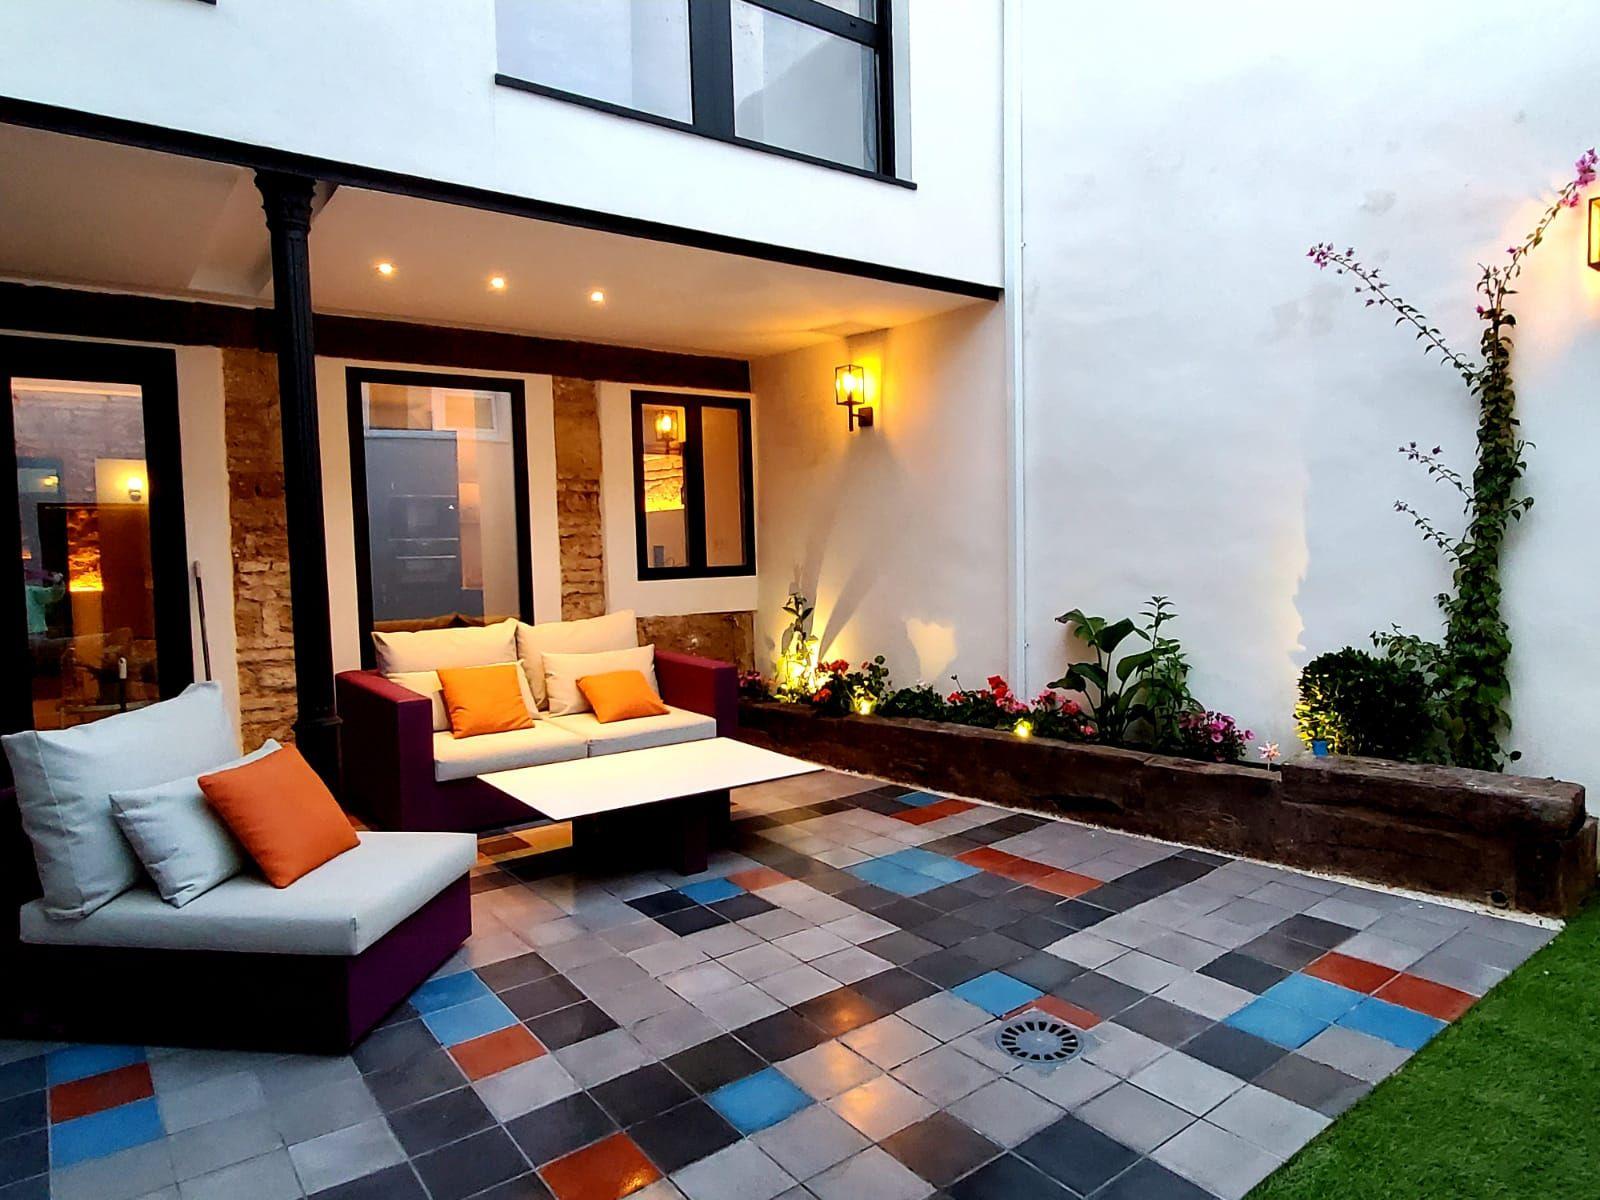 Dimensi-on presenta algunos trucos para decorar terrazas